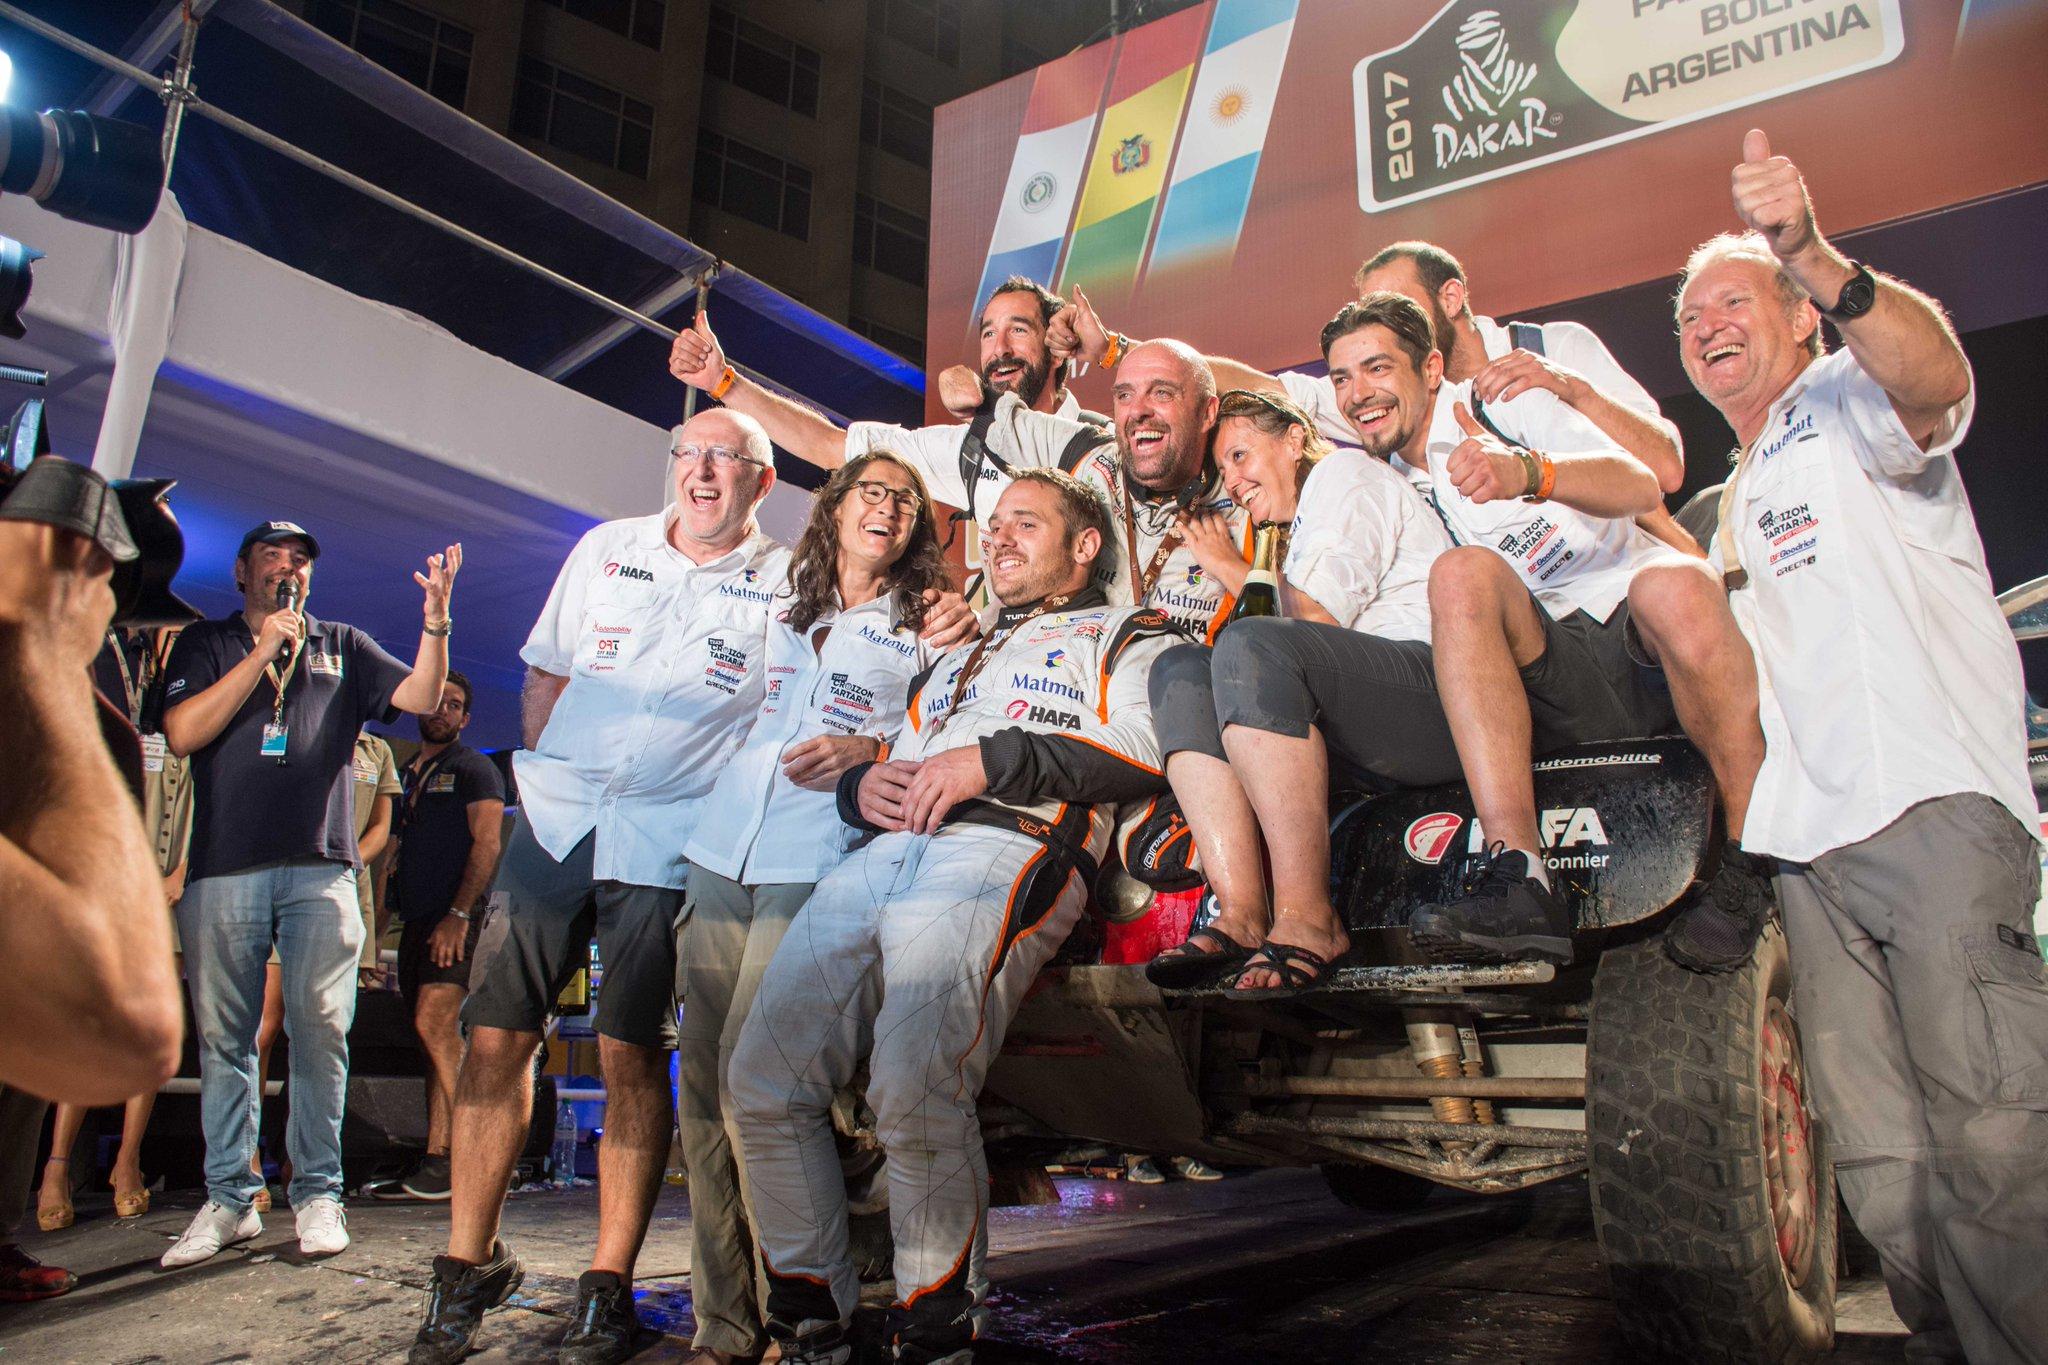 Auto/Moto - Dakar - Le quadri-amputé Philippe Croizon a réussi son pari fou